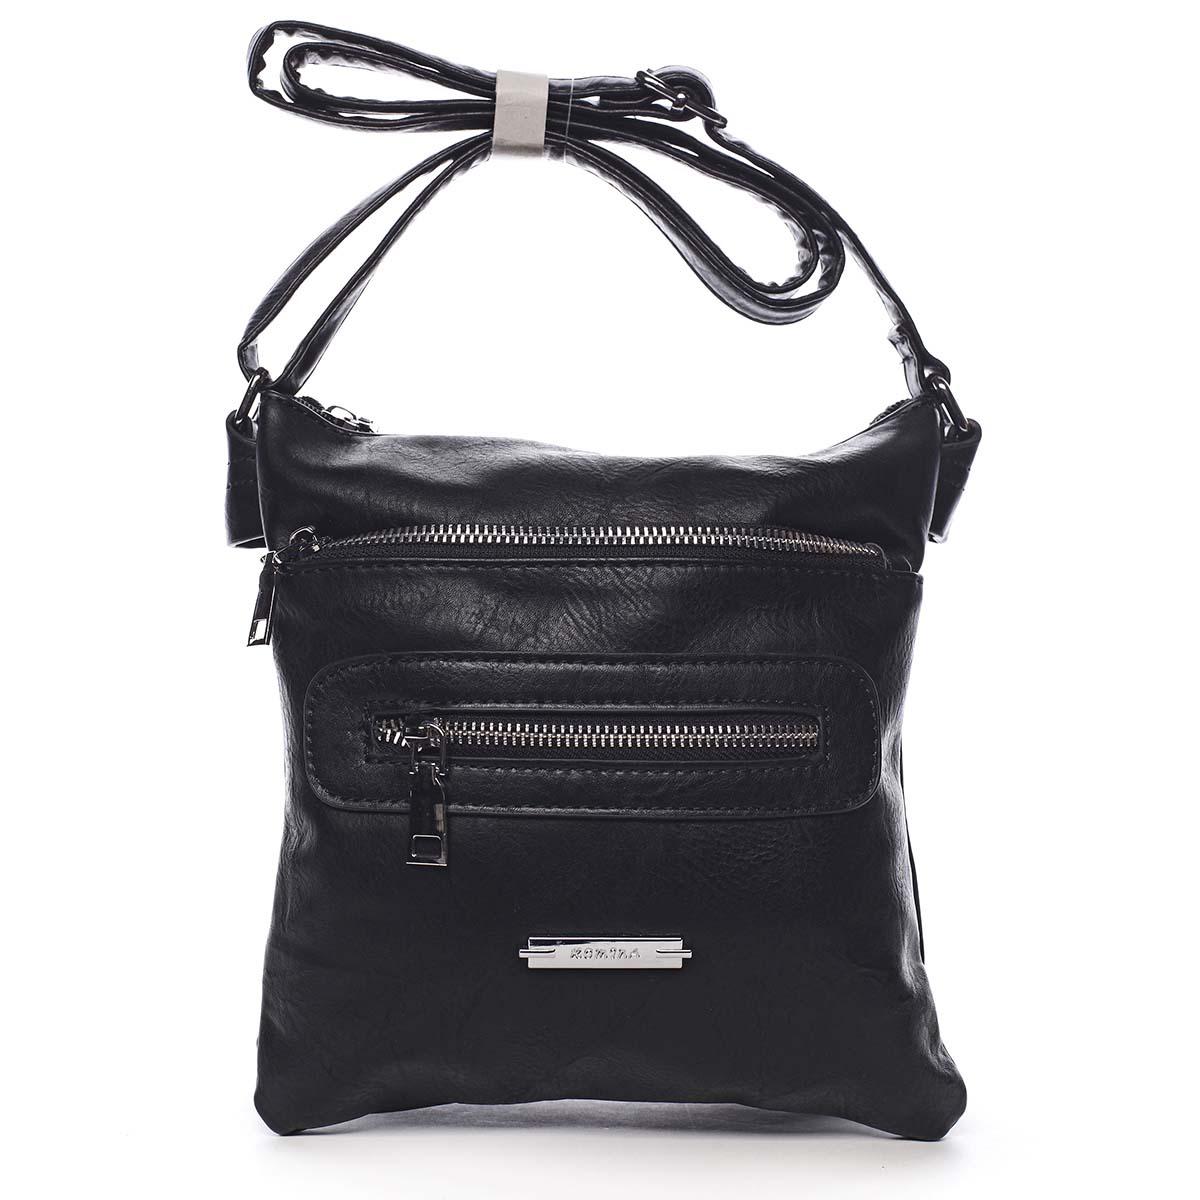 Dámska crossbody kabelka čierna - Romina Chasing čierna